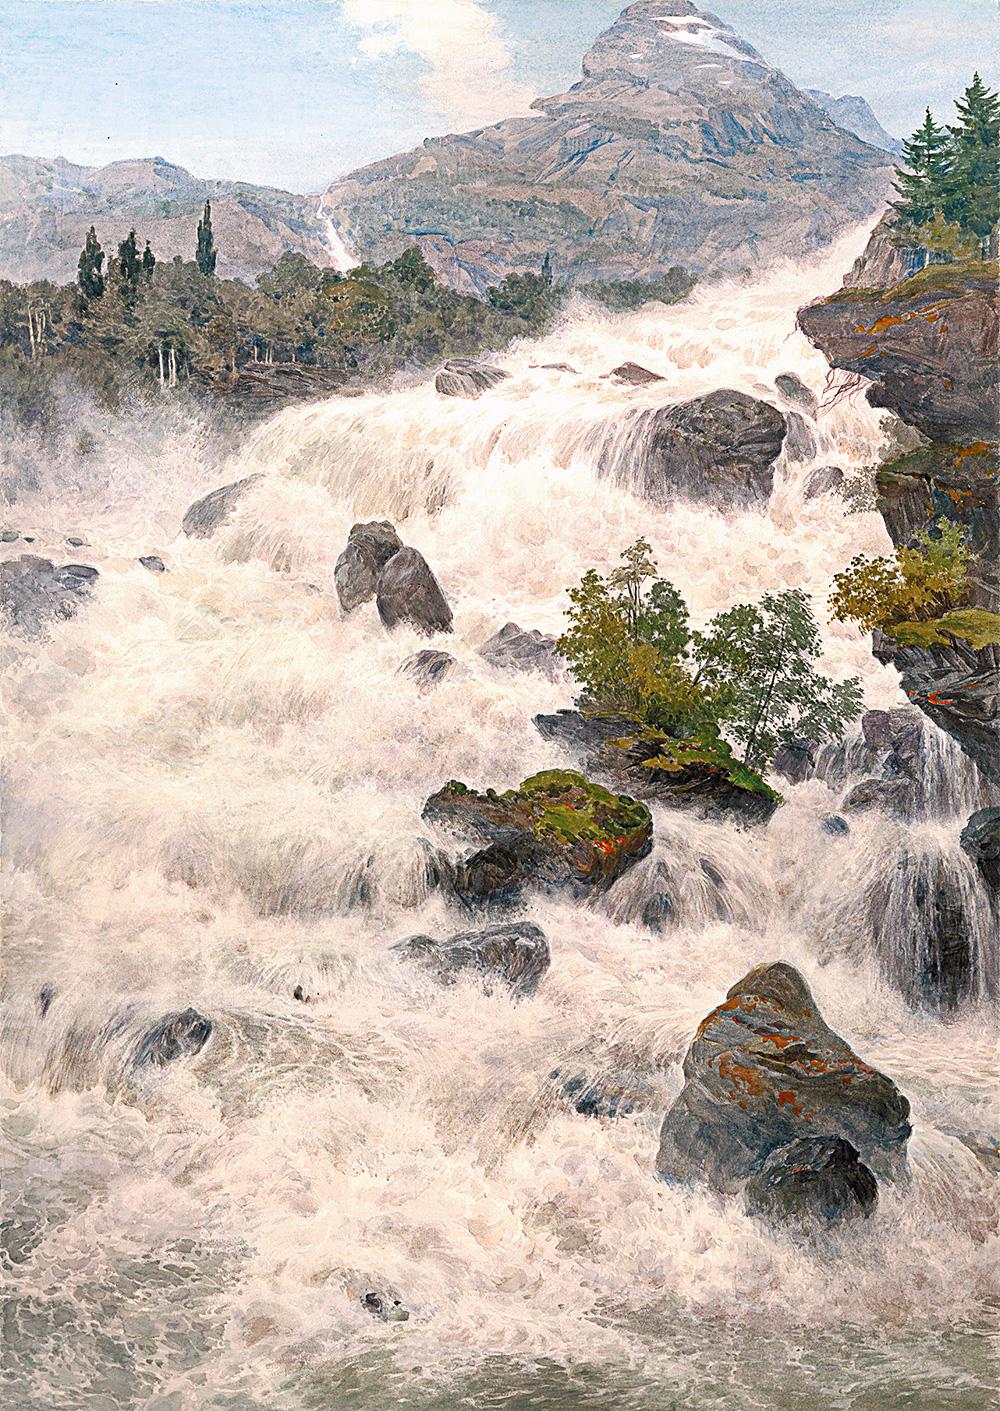 «Водопад в Норвегии», 2007 г. Сергей Андрияка